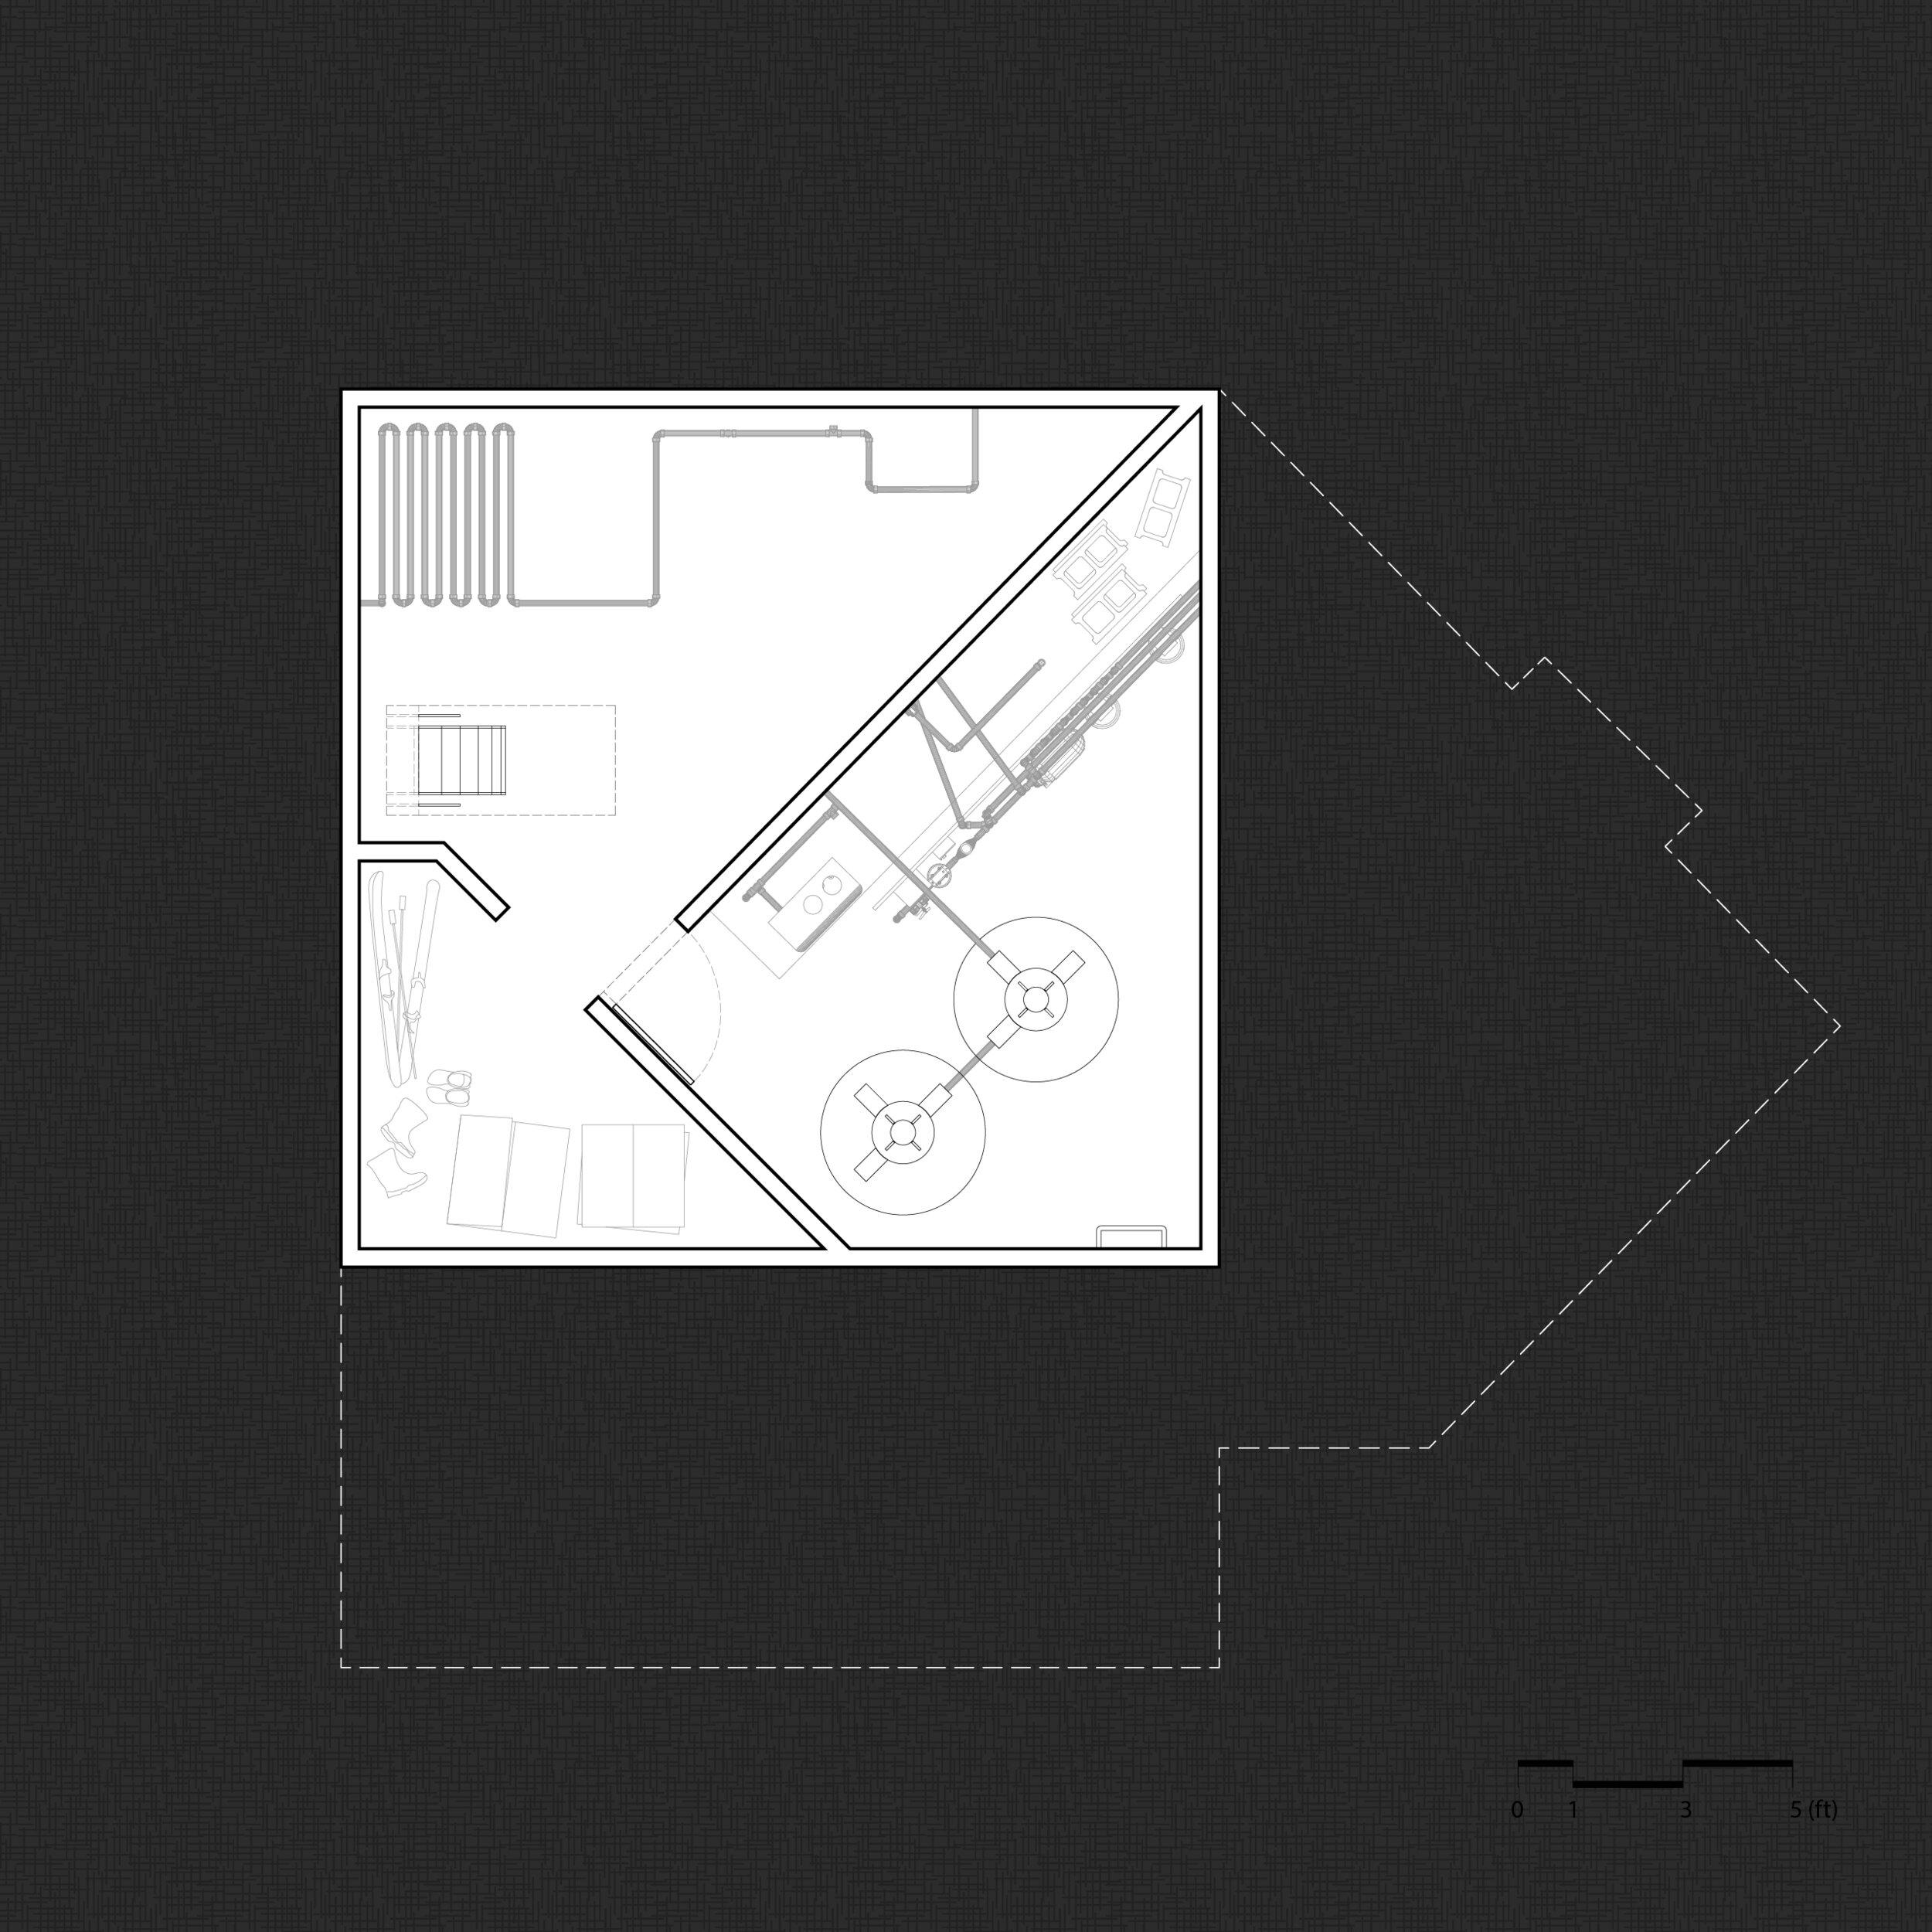 StudioAmes_Ecetra_Plan_UG (1'=1-4-).jpg